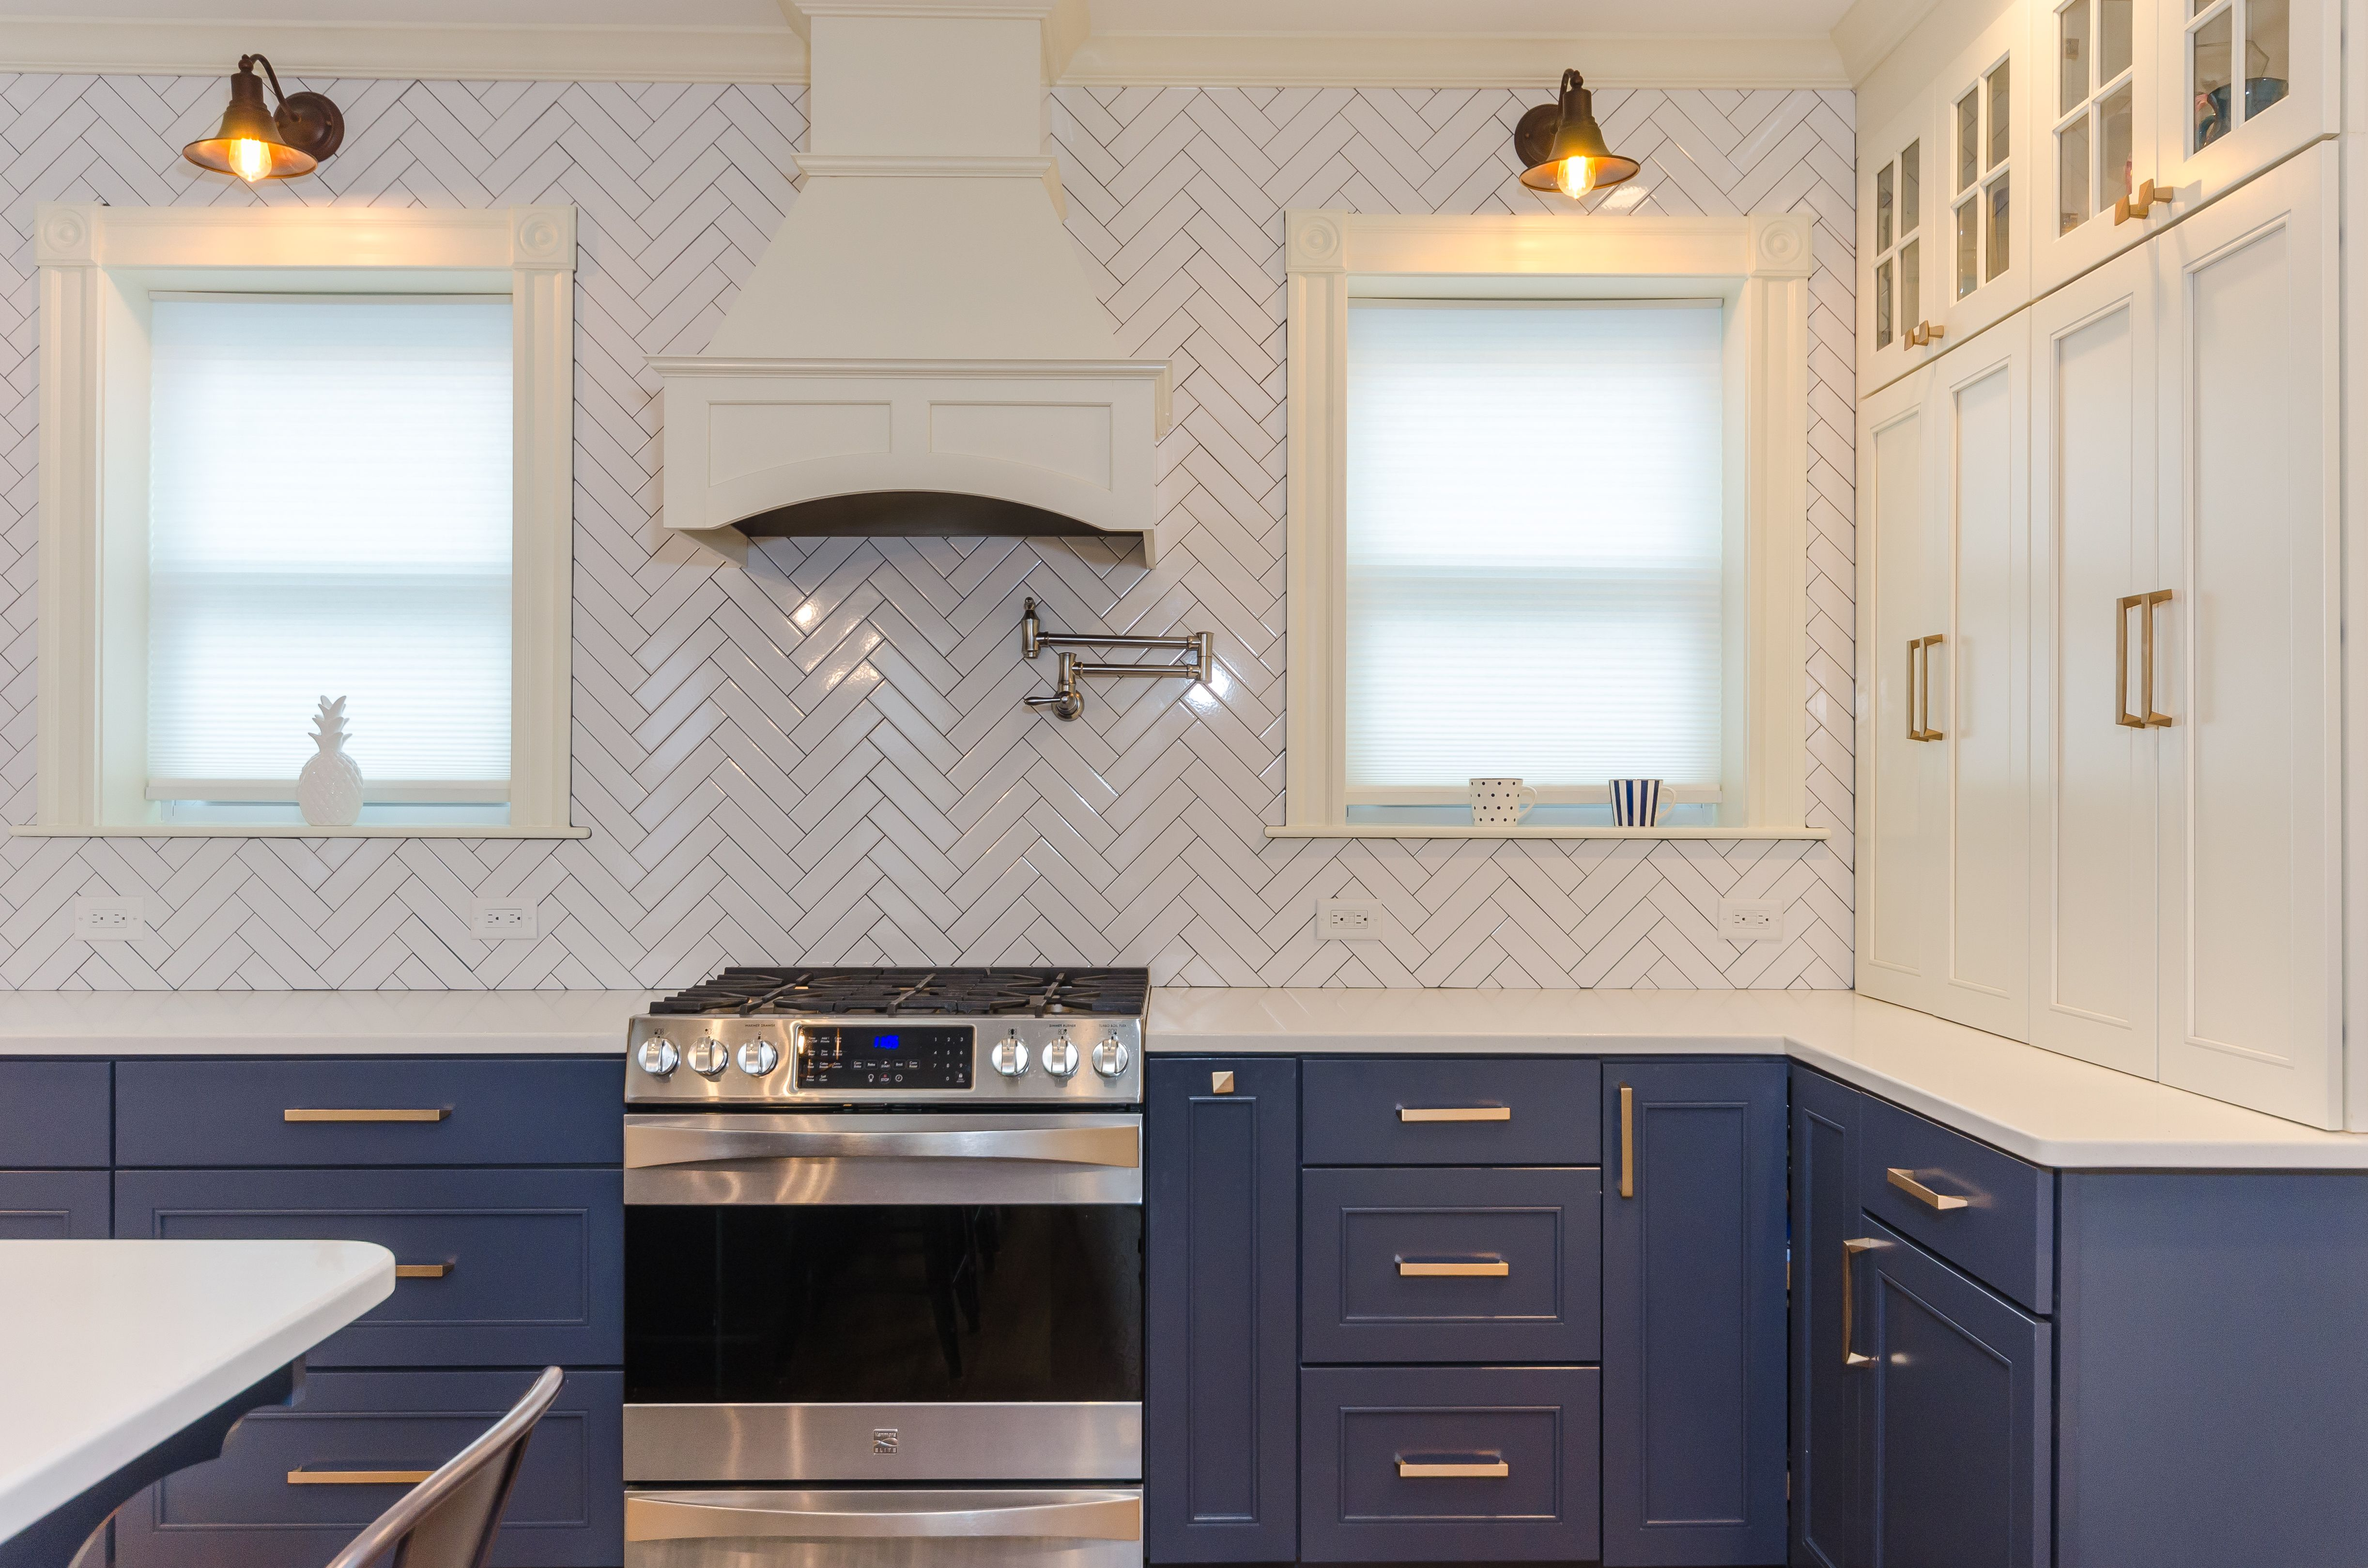 Herringbone tile, kitchen design, backsplash, two toned ...